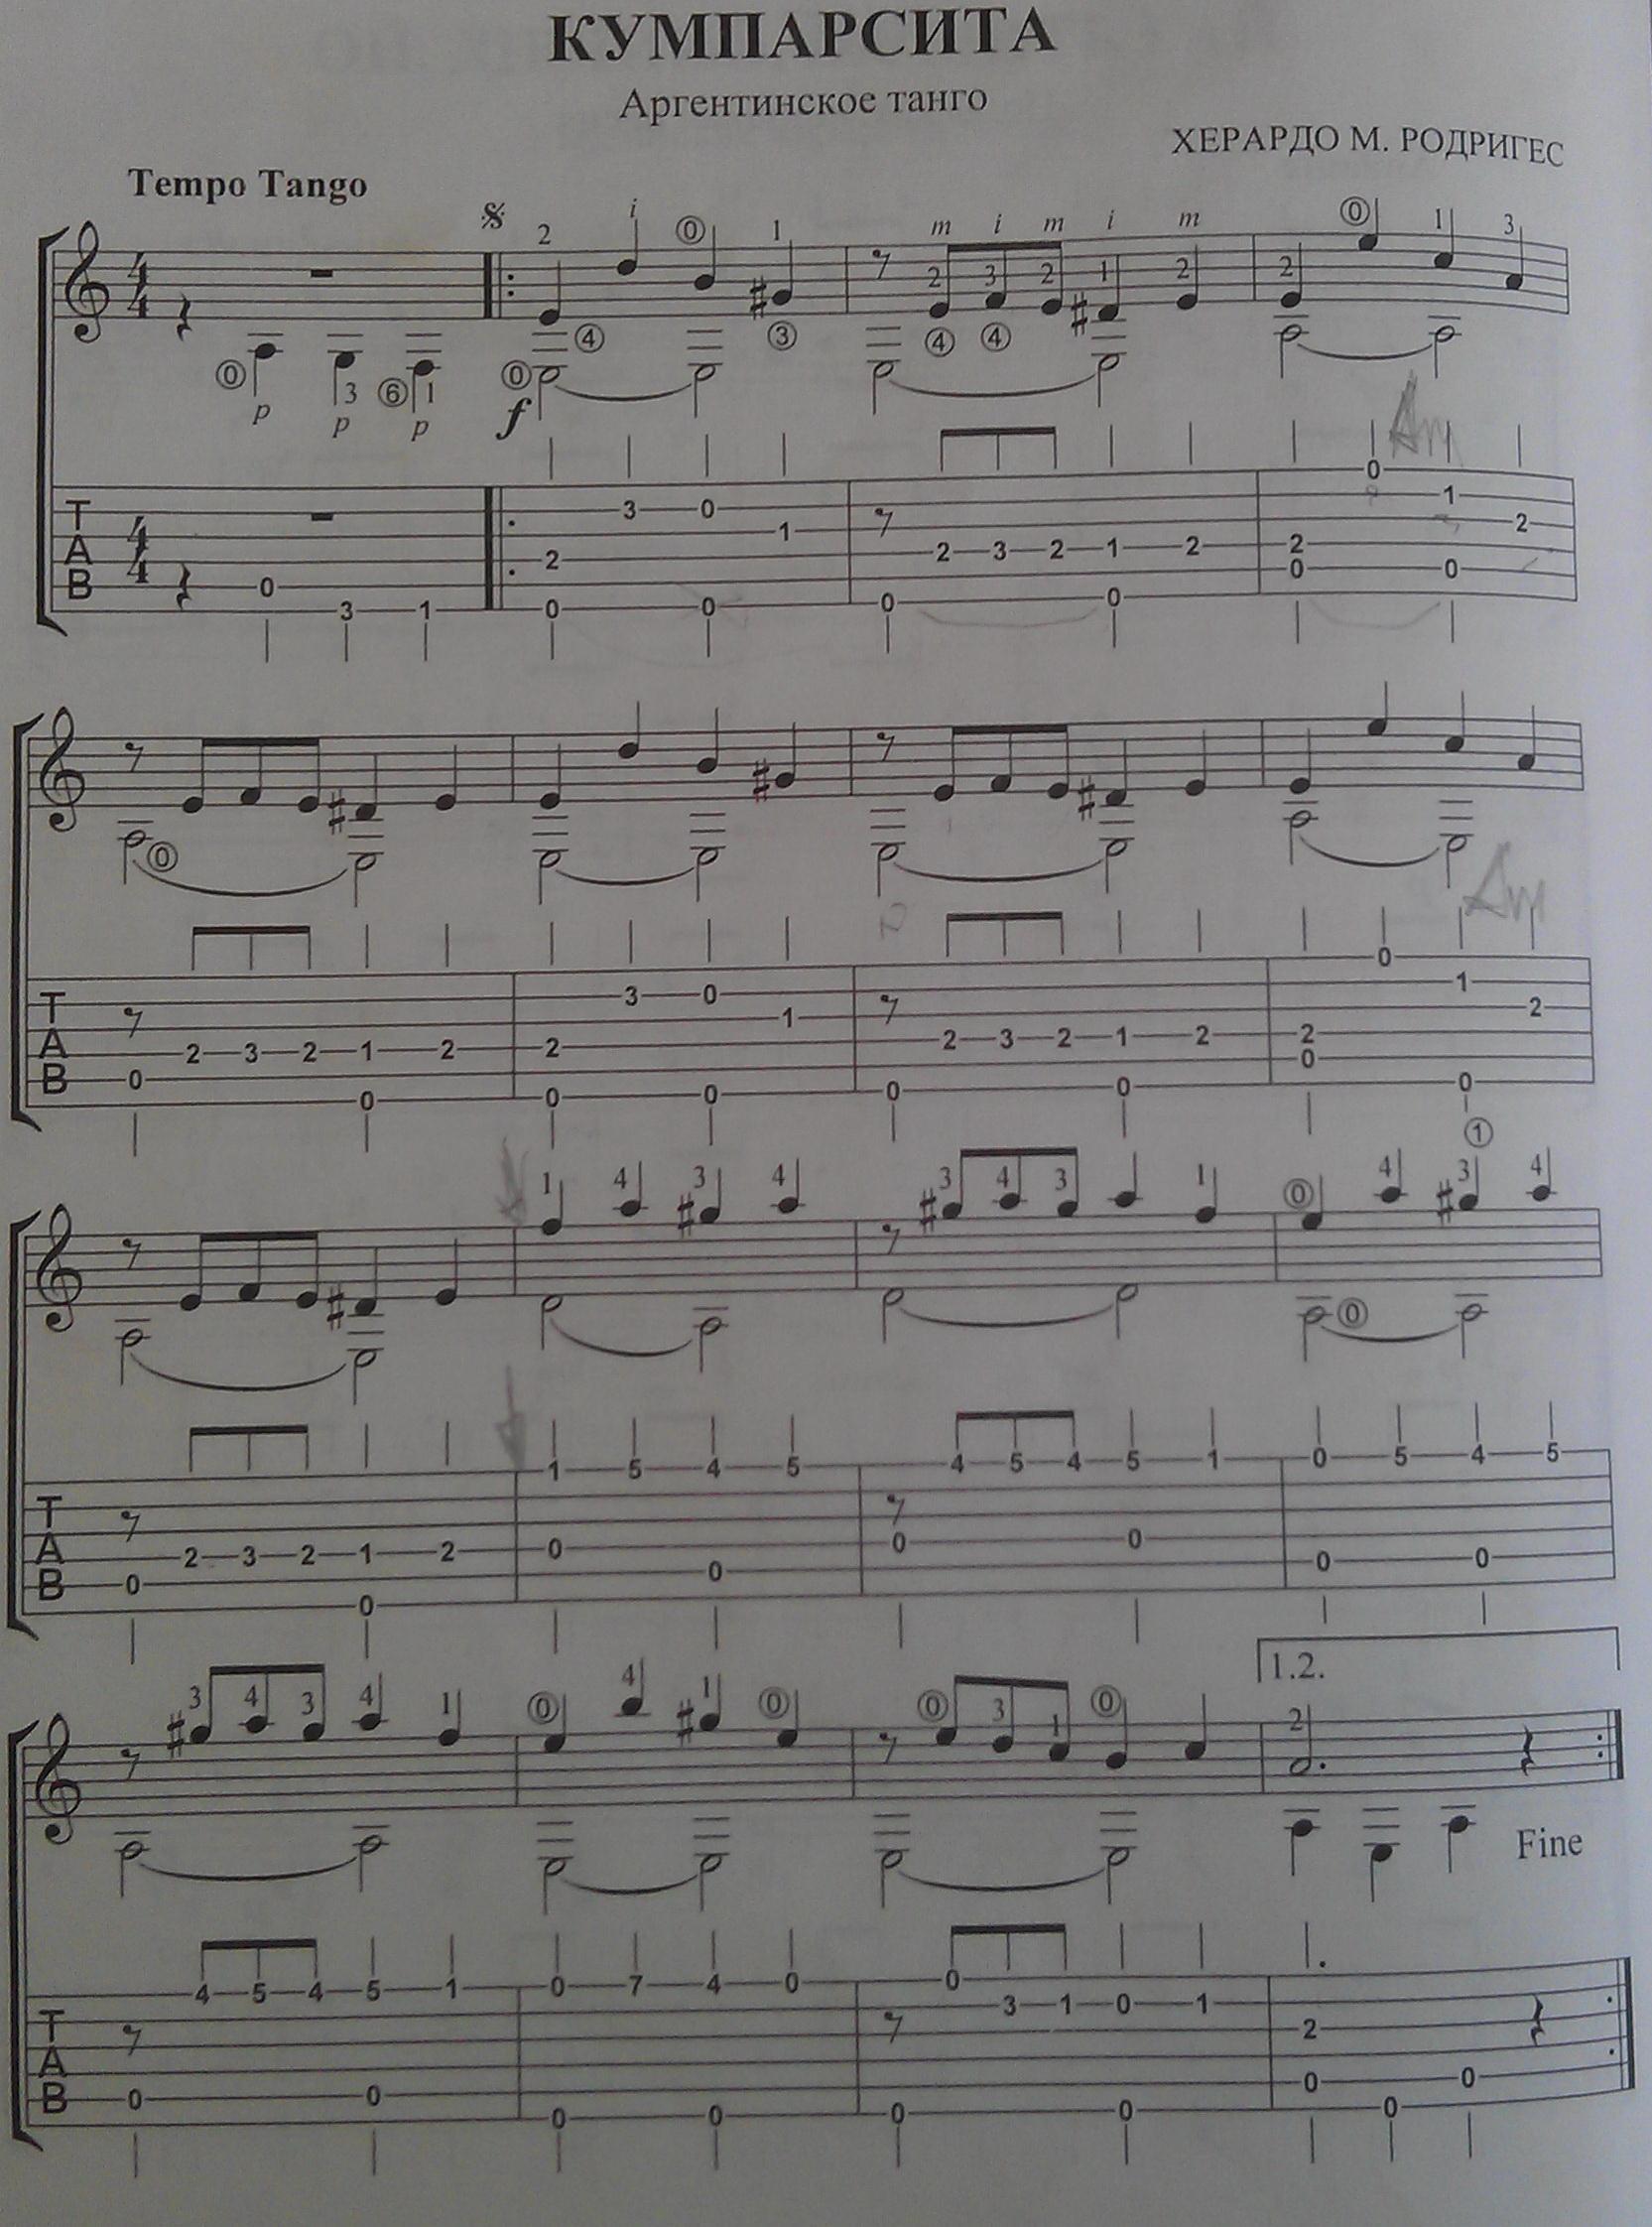 Кумпарсита (танго) – с аккордами